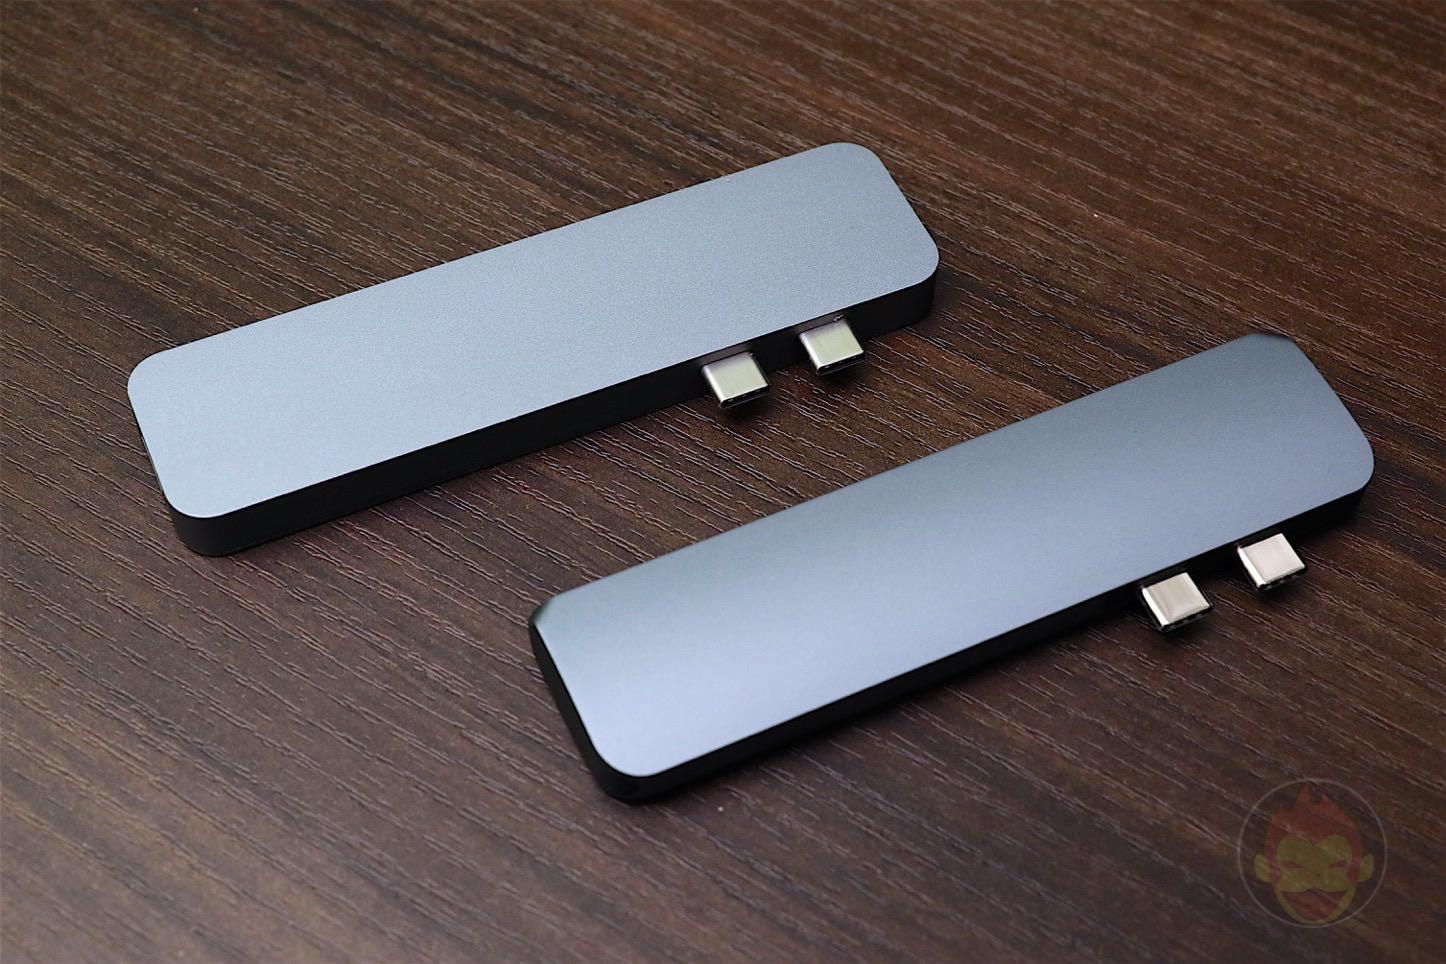 Satechi-TypeC-Pro-Hub-VS-HyperDrive-USBC-Hub-06.jpg